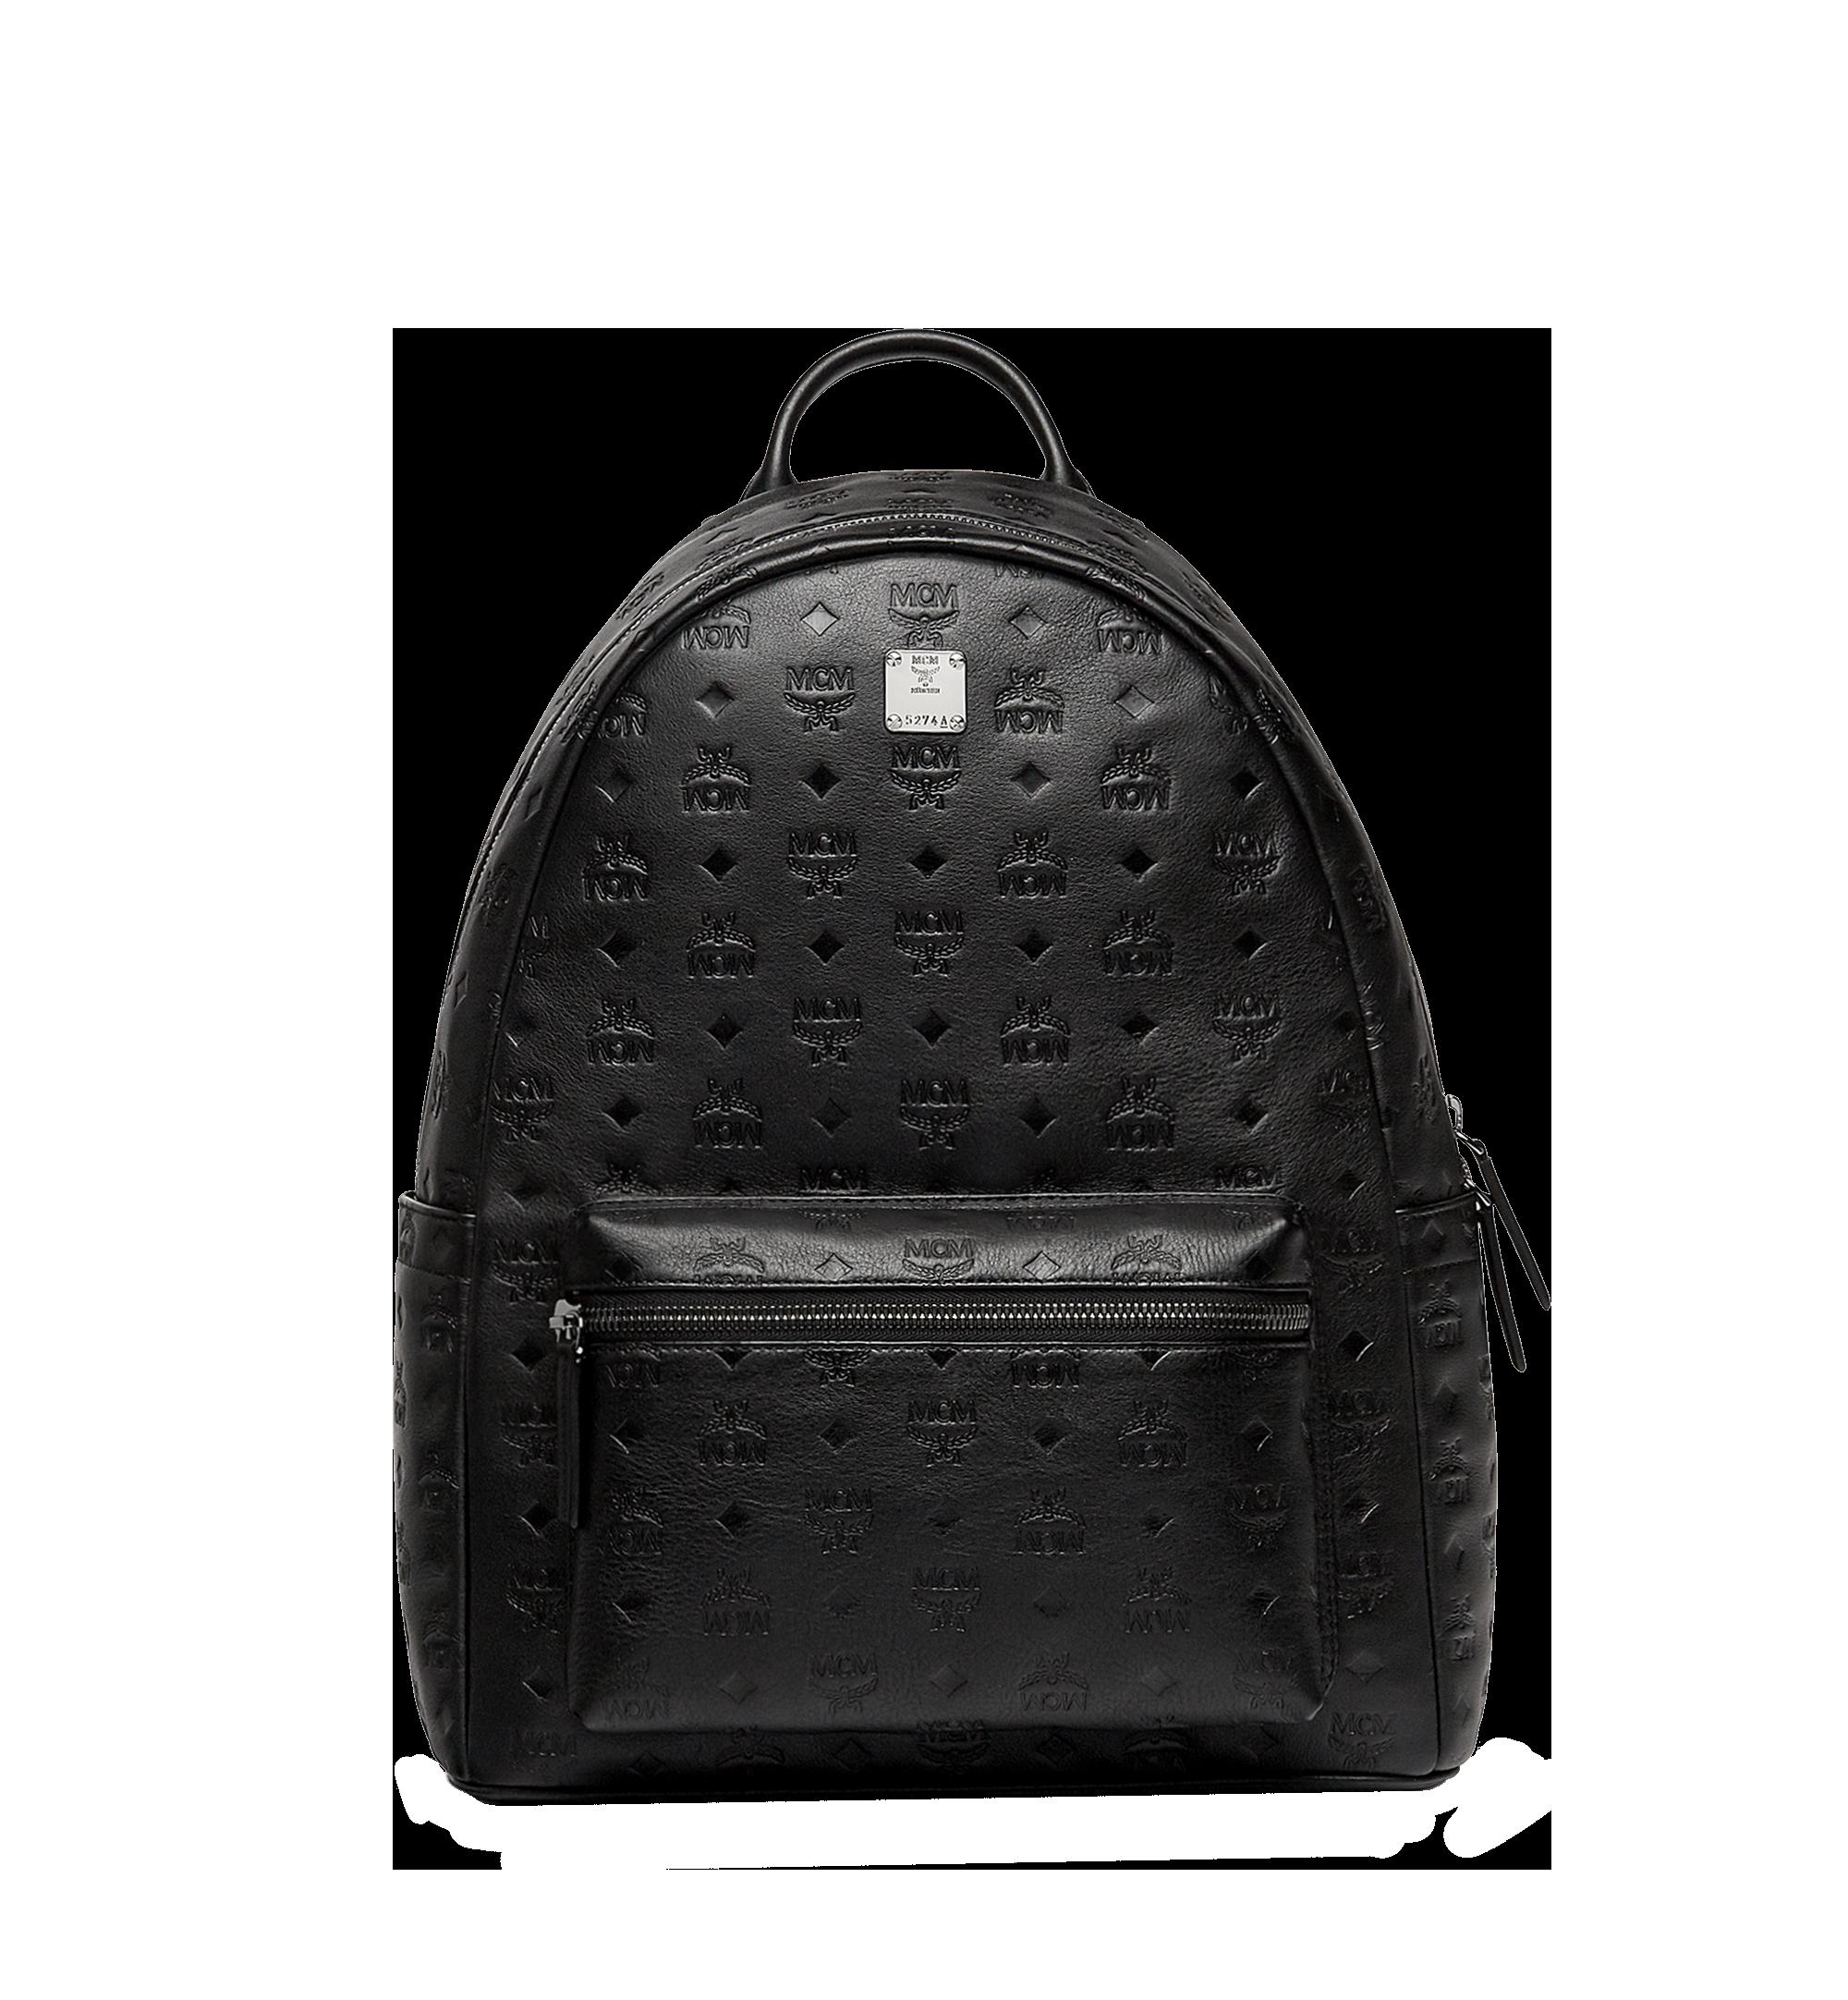 40 Cm 16 In Stark Backpack In Monogram Leather Black Mcm Nl